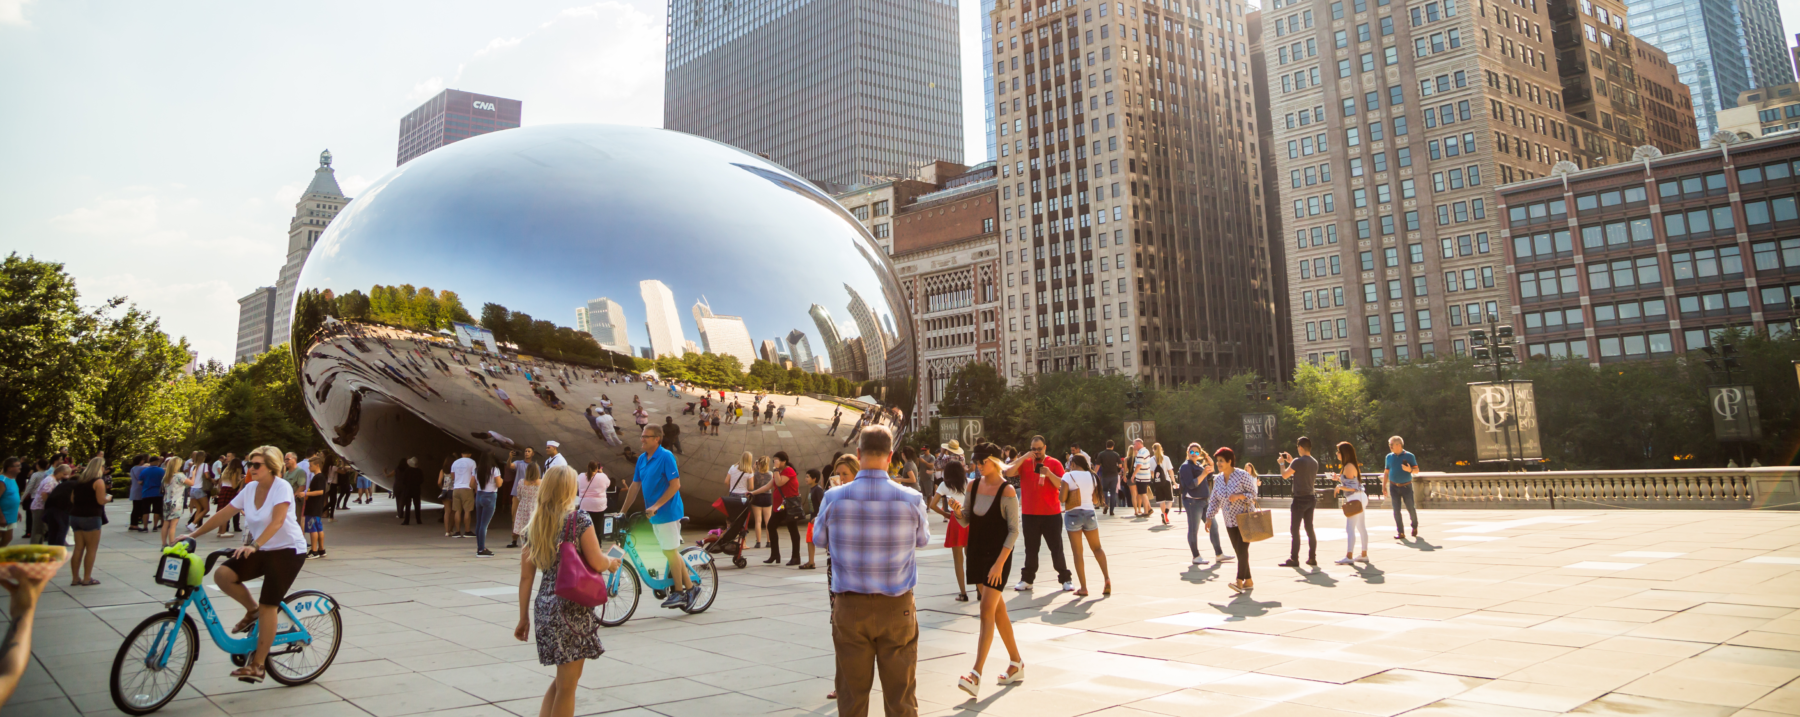 Guide to Chicago's Millennium Park